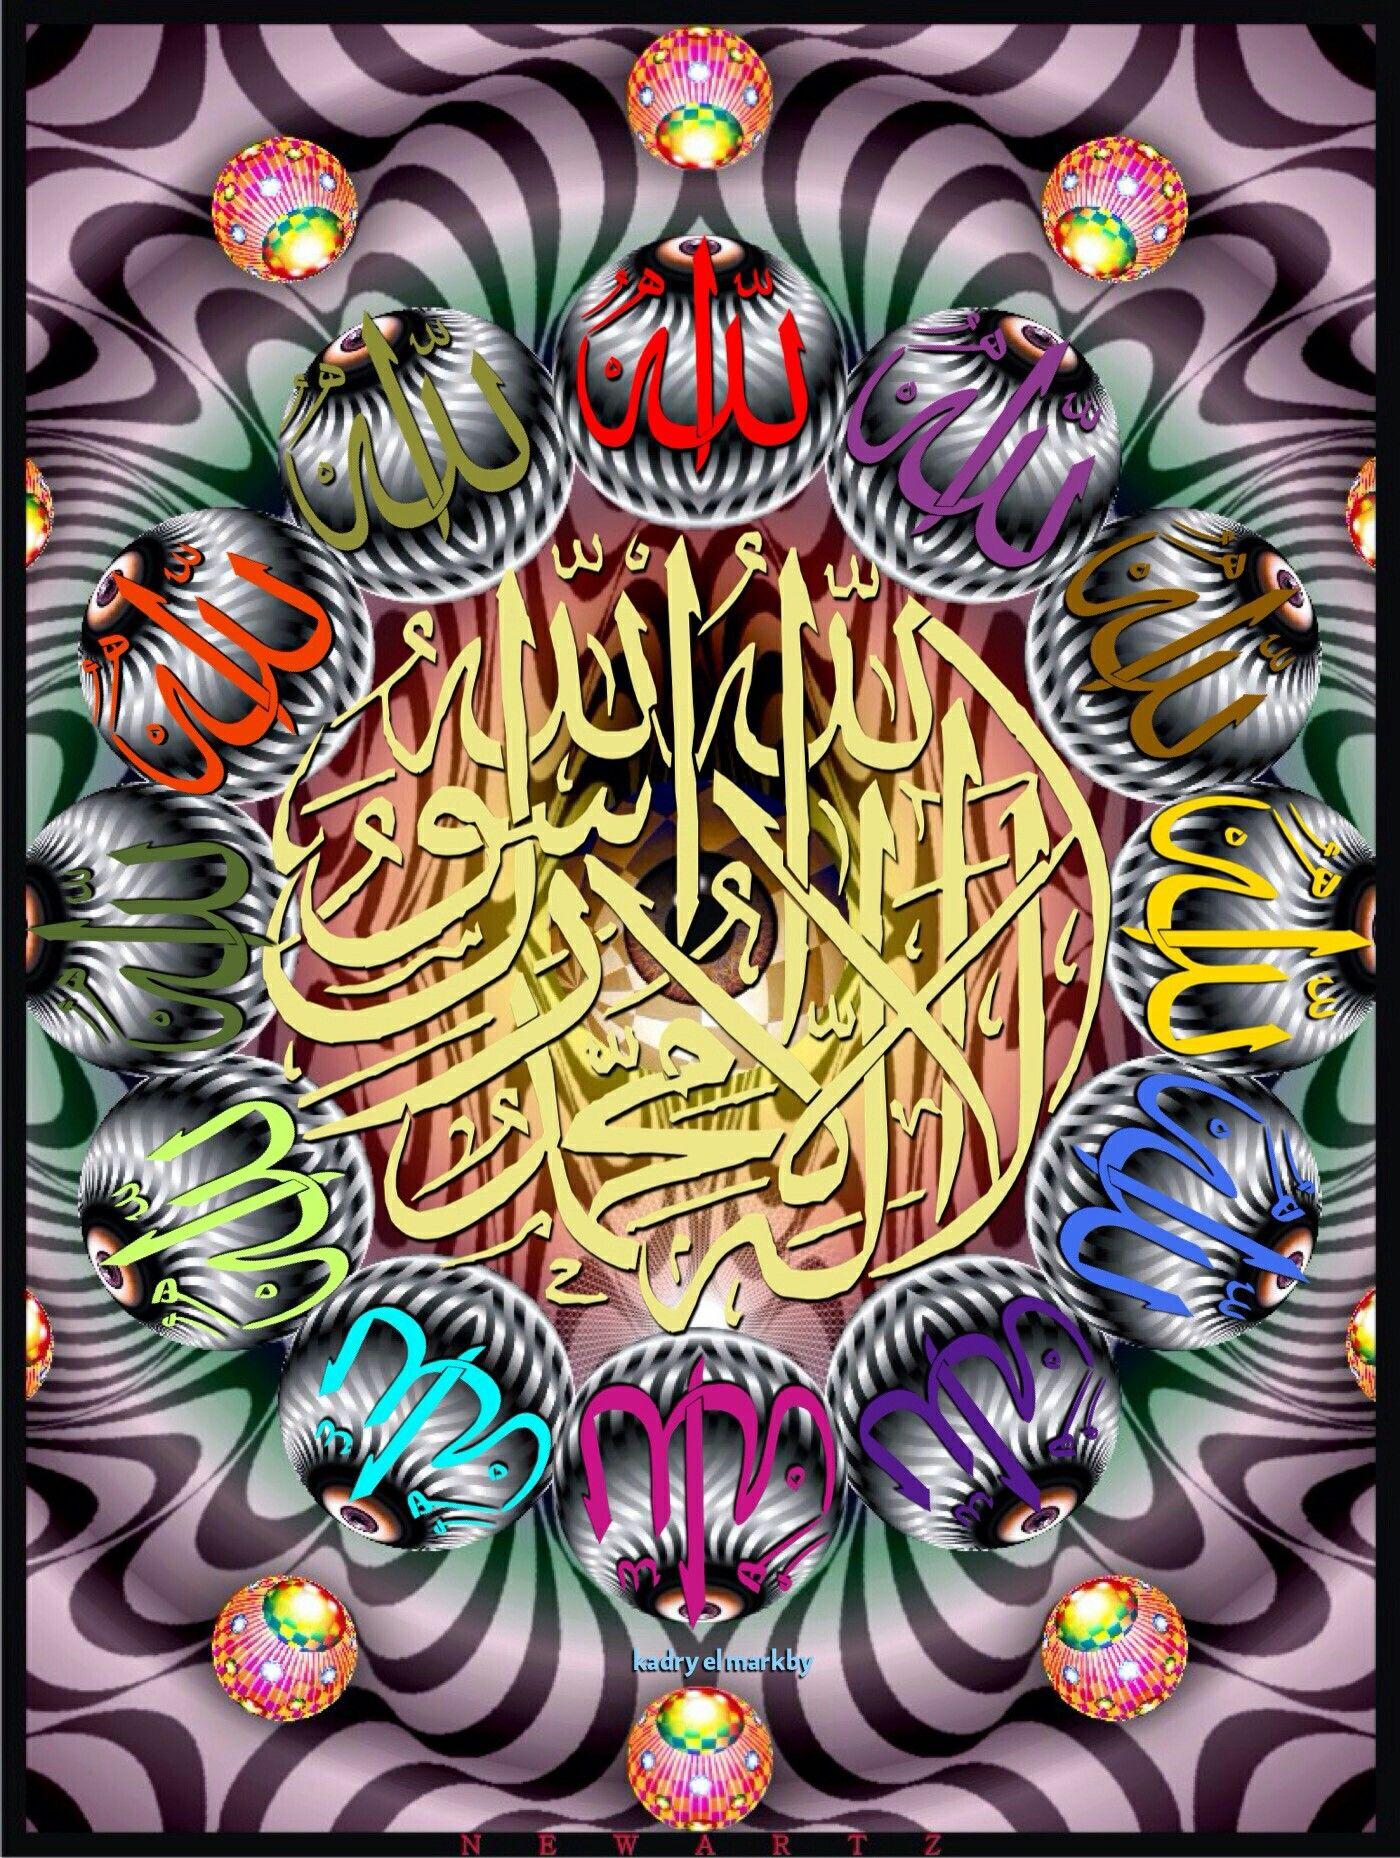 Desertrose لا إله إلا الله محمد رسول الله Islamic Art Islamic Caligraphy Islamic Calligraphy